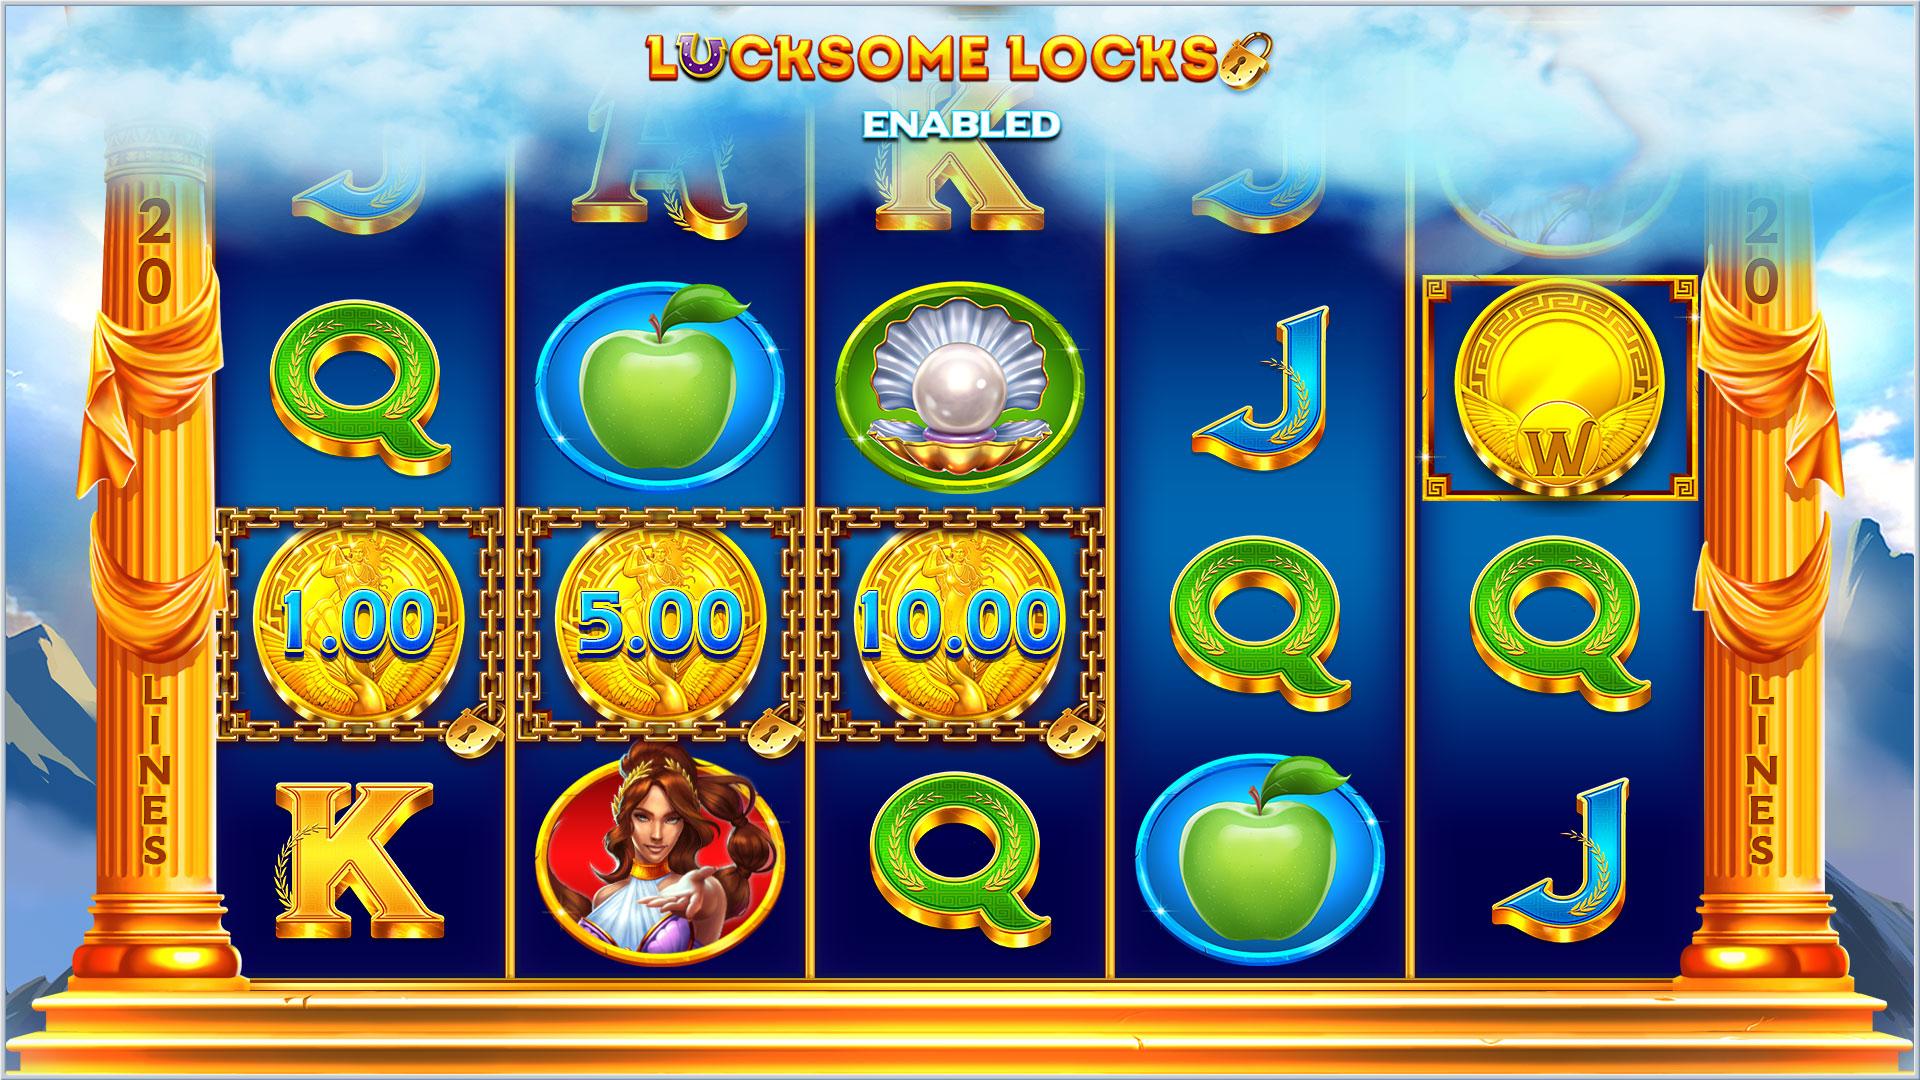 lucksome_locks_enabled